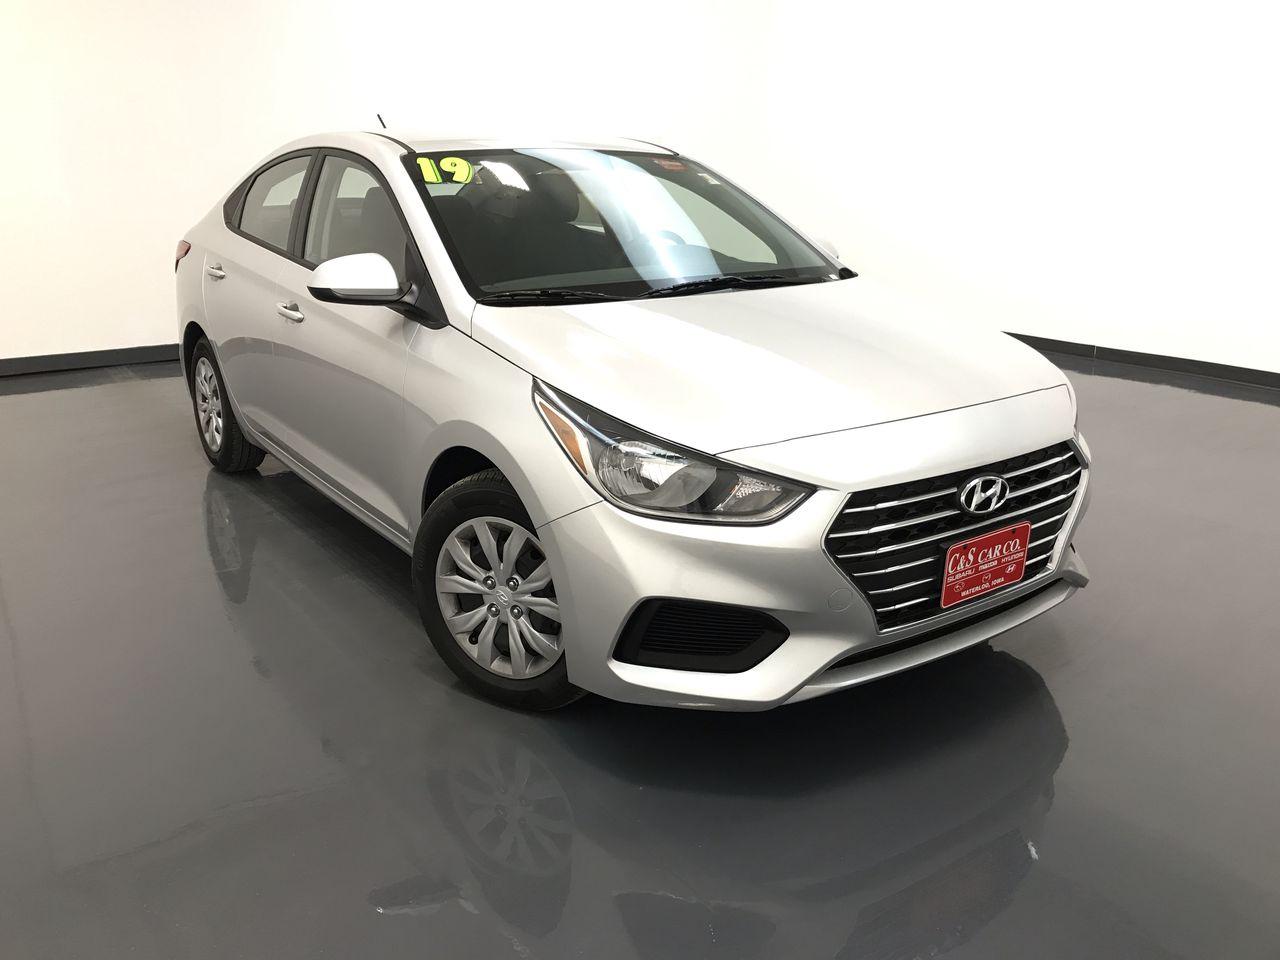 2019 Hyundai Accent  - C & S Car Company